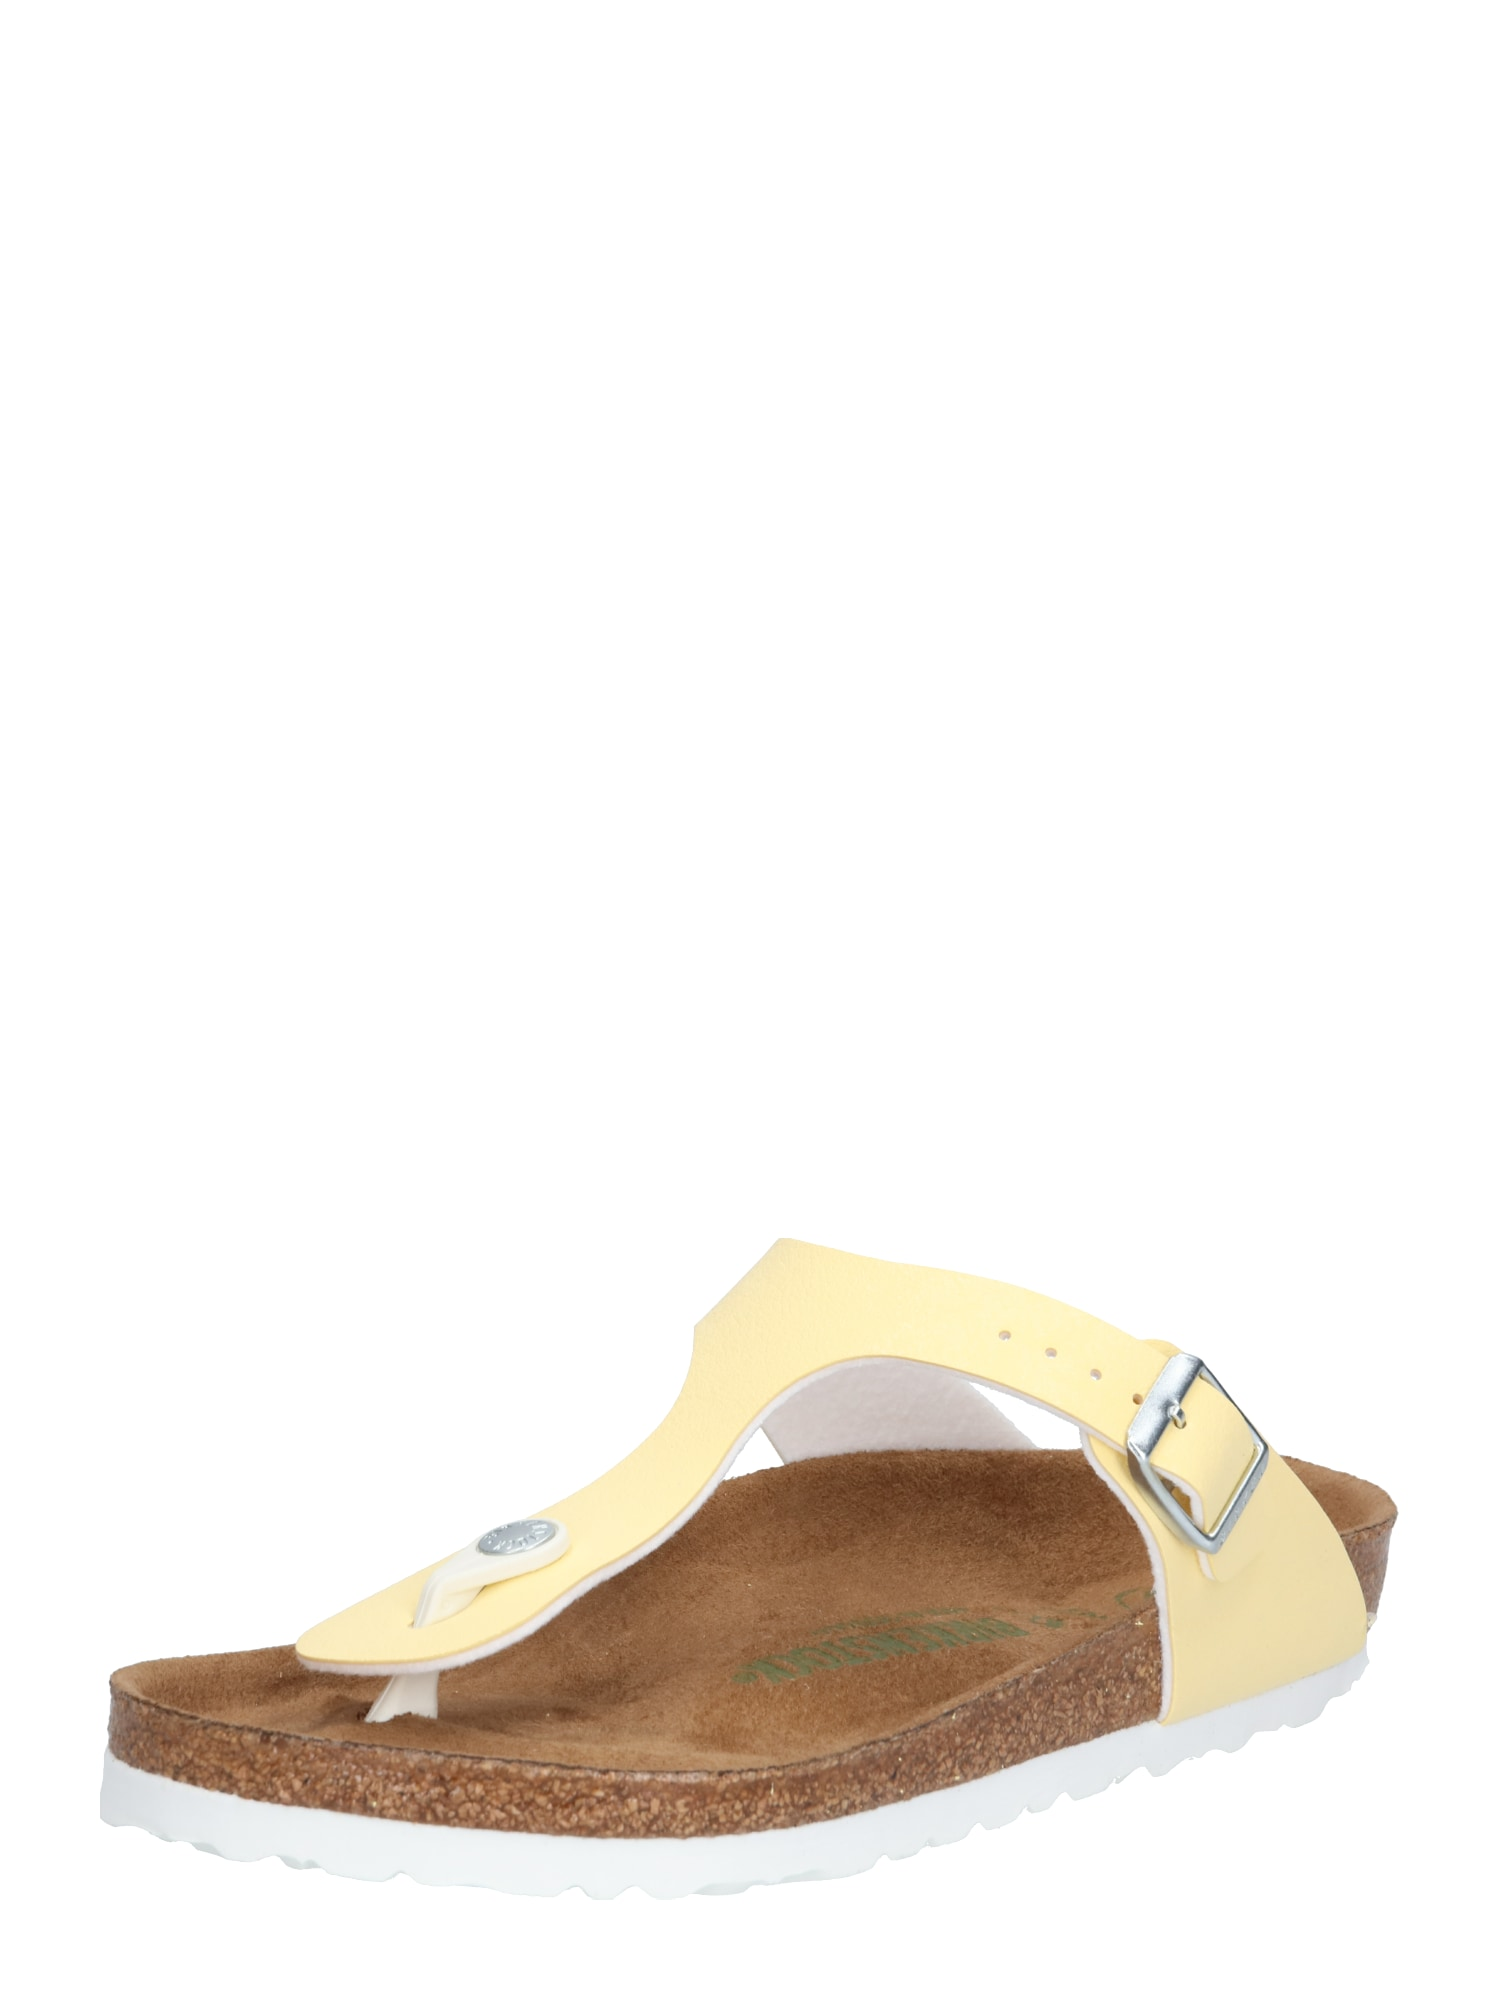 Pantofle Gizeh BF Brushed Vanilla VEG2 žlutá BIRKENSTOCK